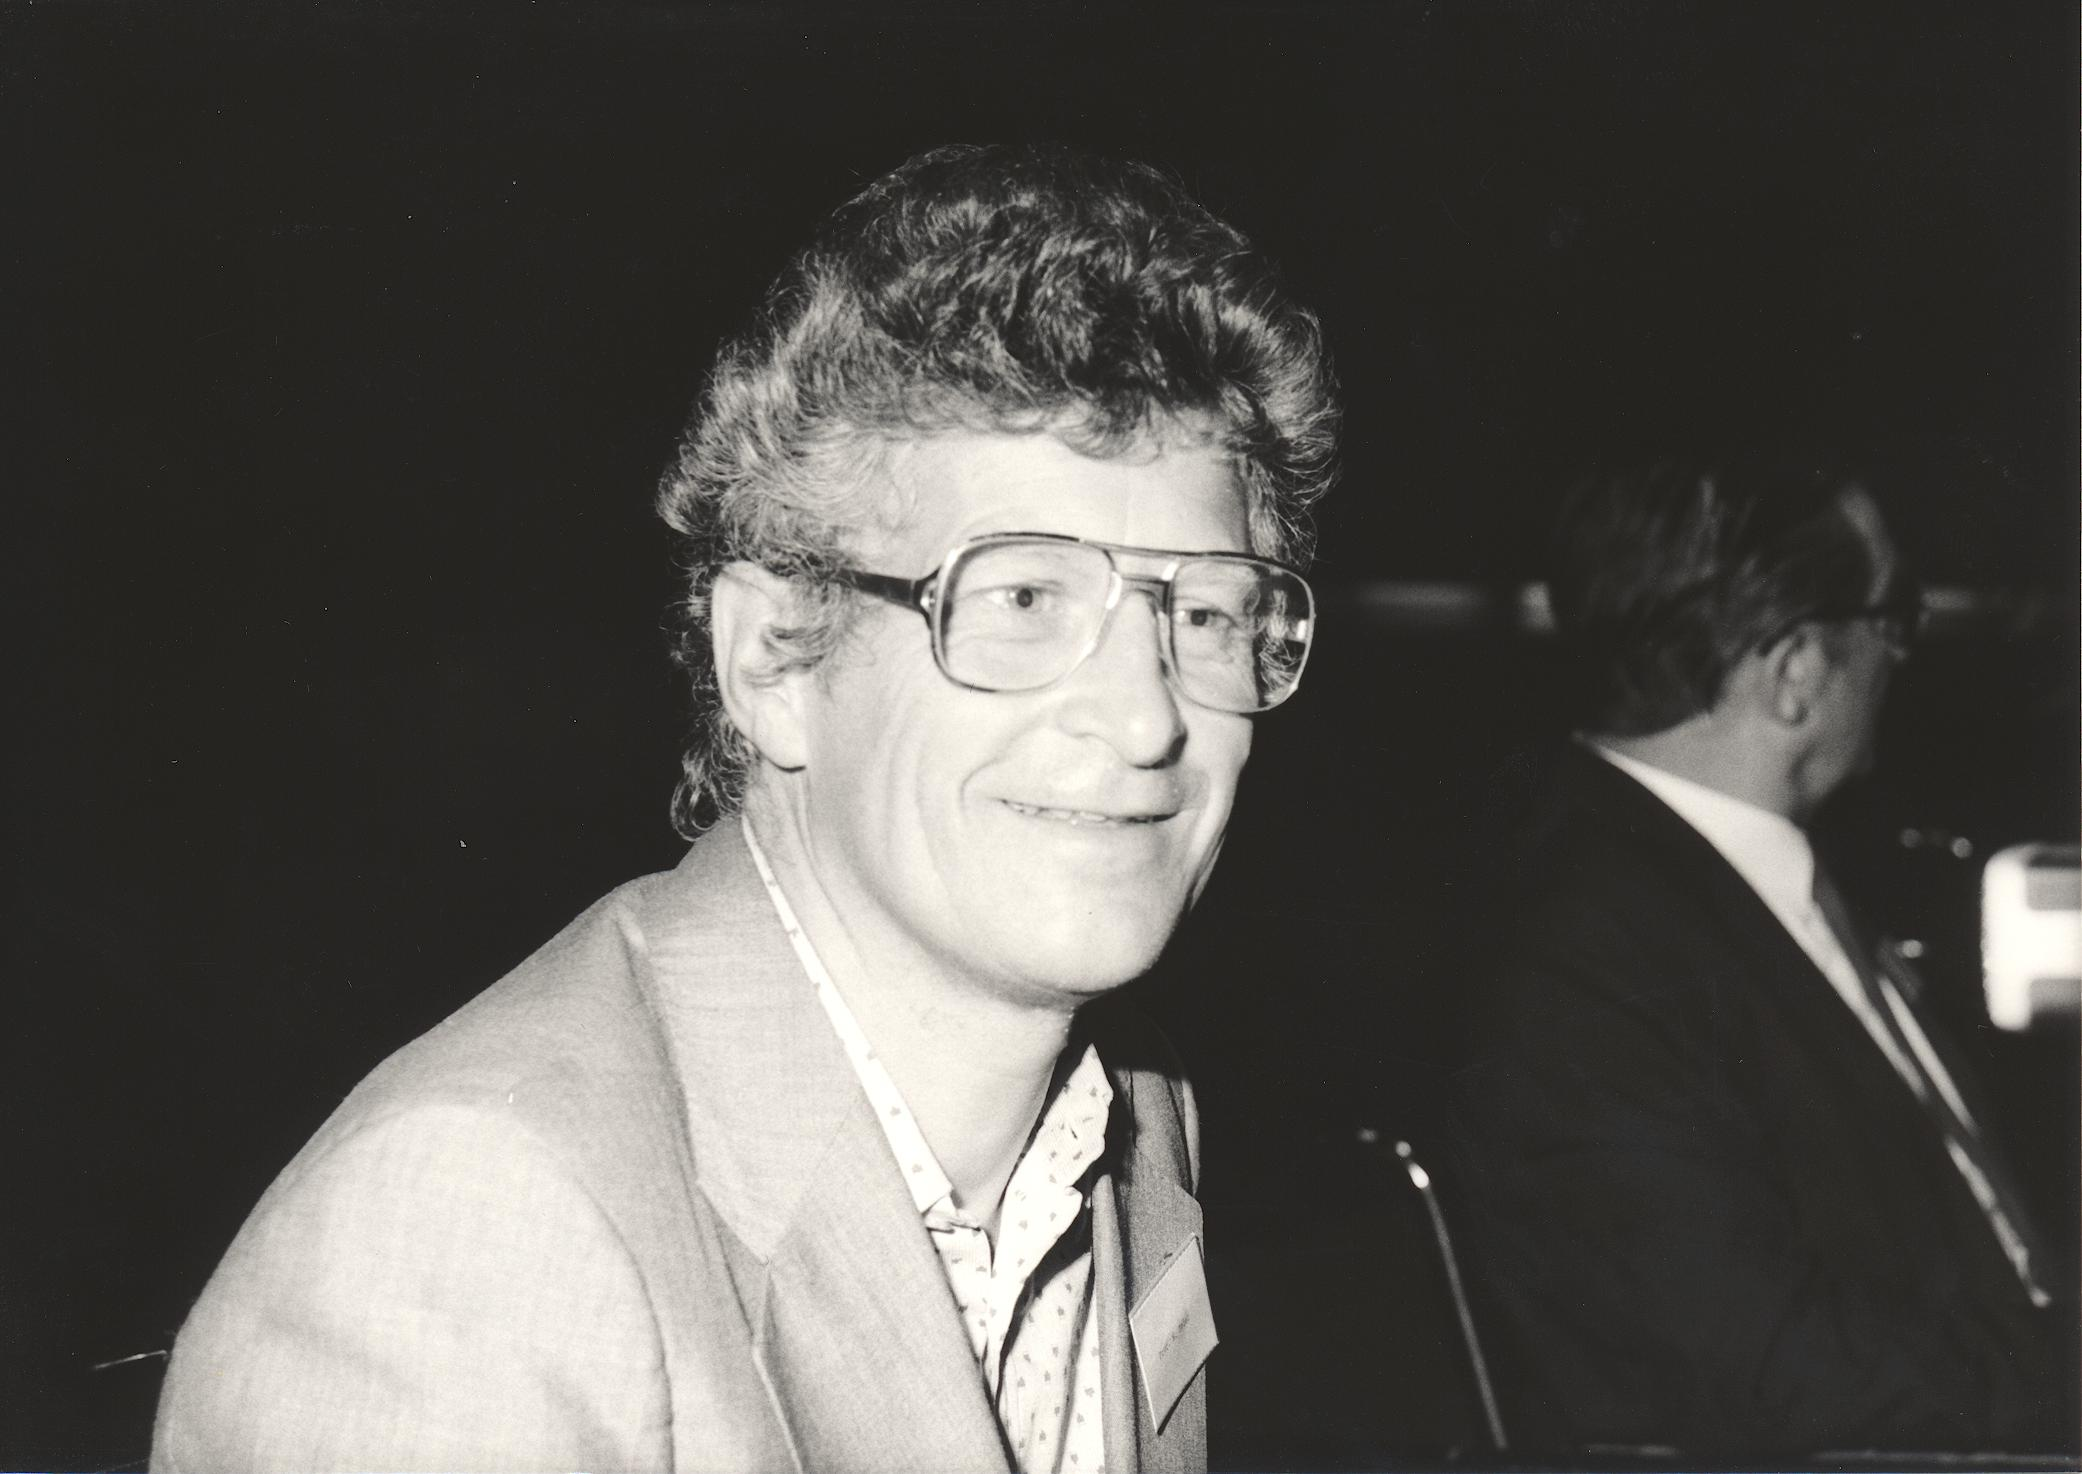 XI. Imago Mundi-Kongress 1987, Innsbruck, Prof. Dr. Hans Zeier